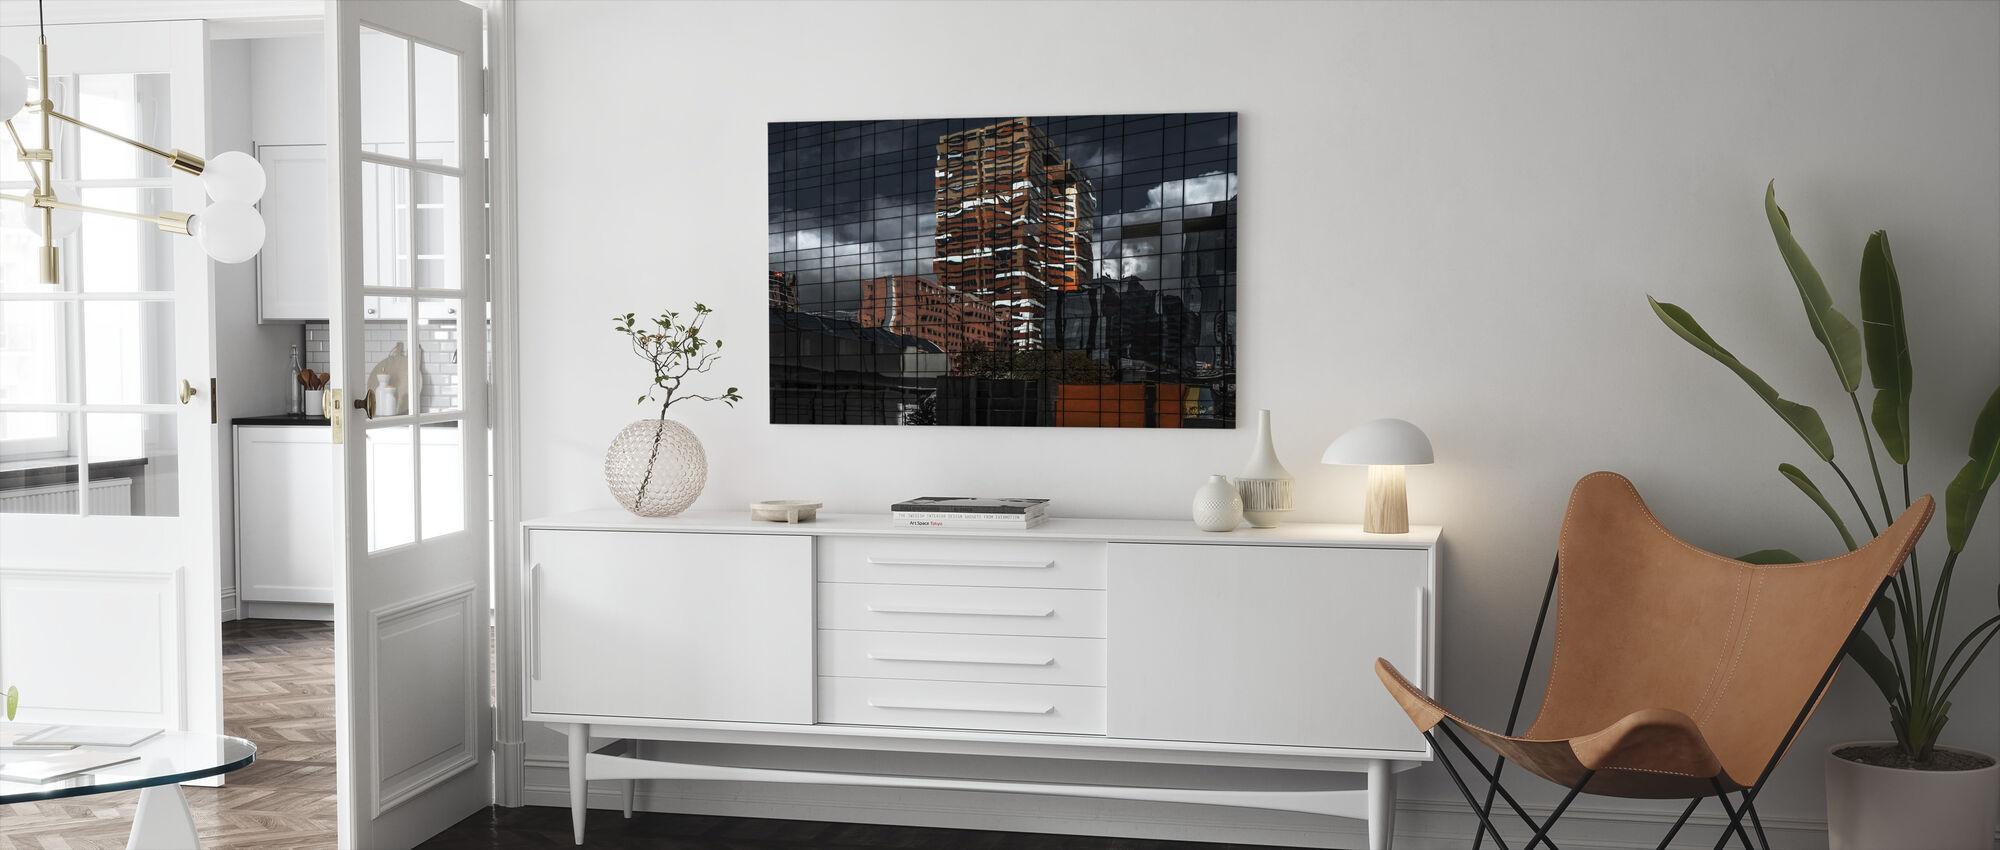 Puzzel Reflectie - Canvas print - Woonkamer